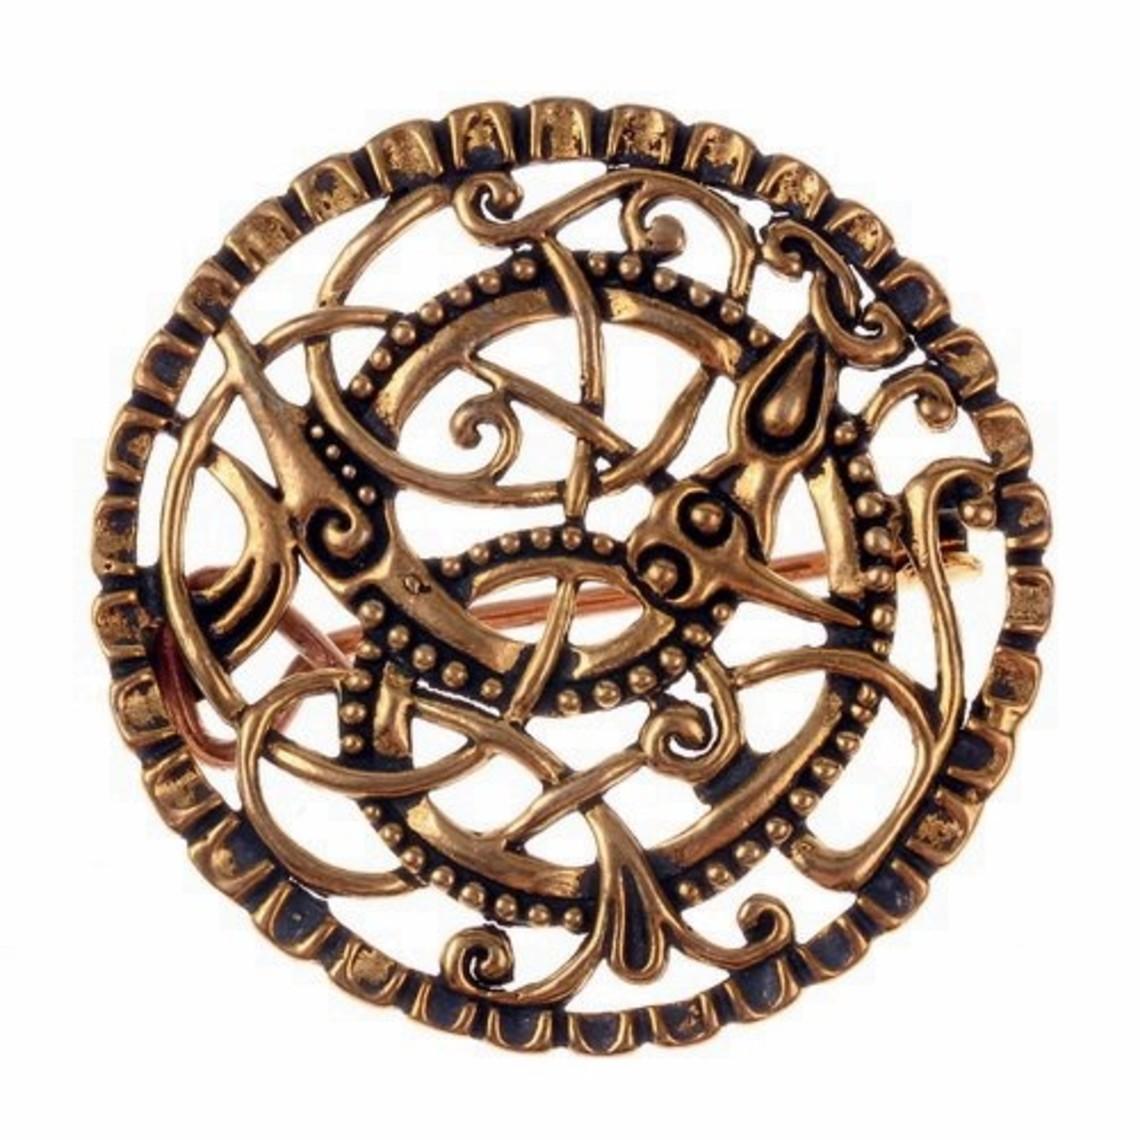 Pitney broche, bronce